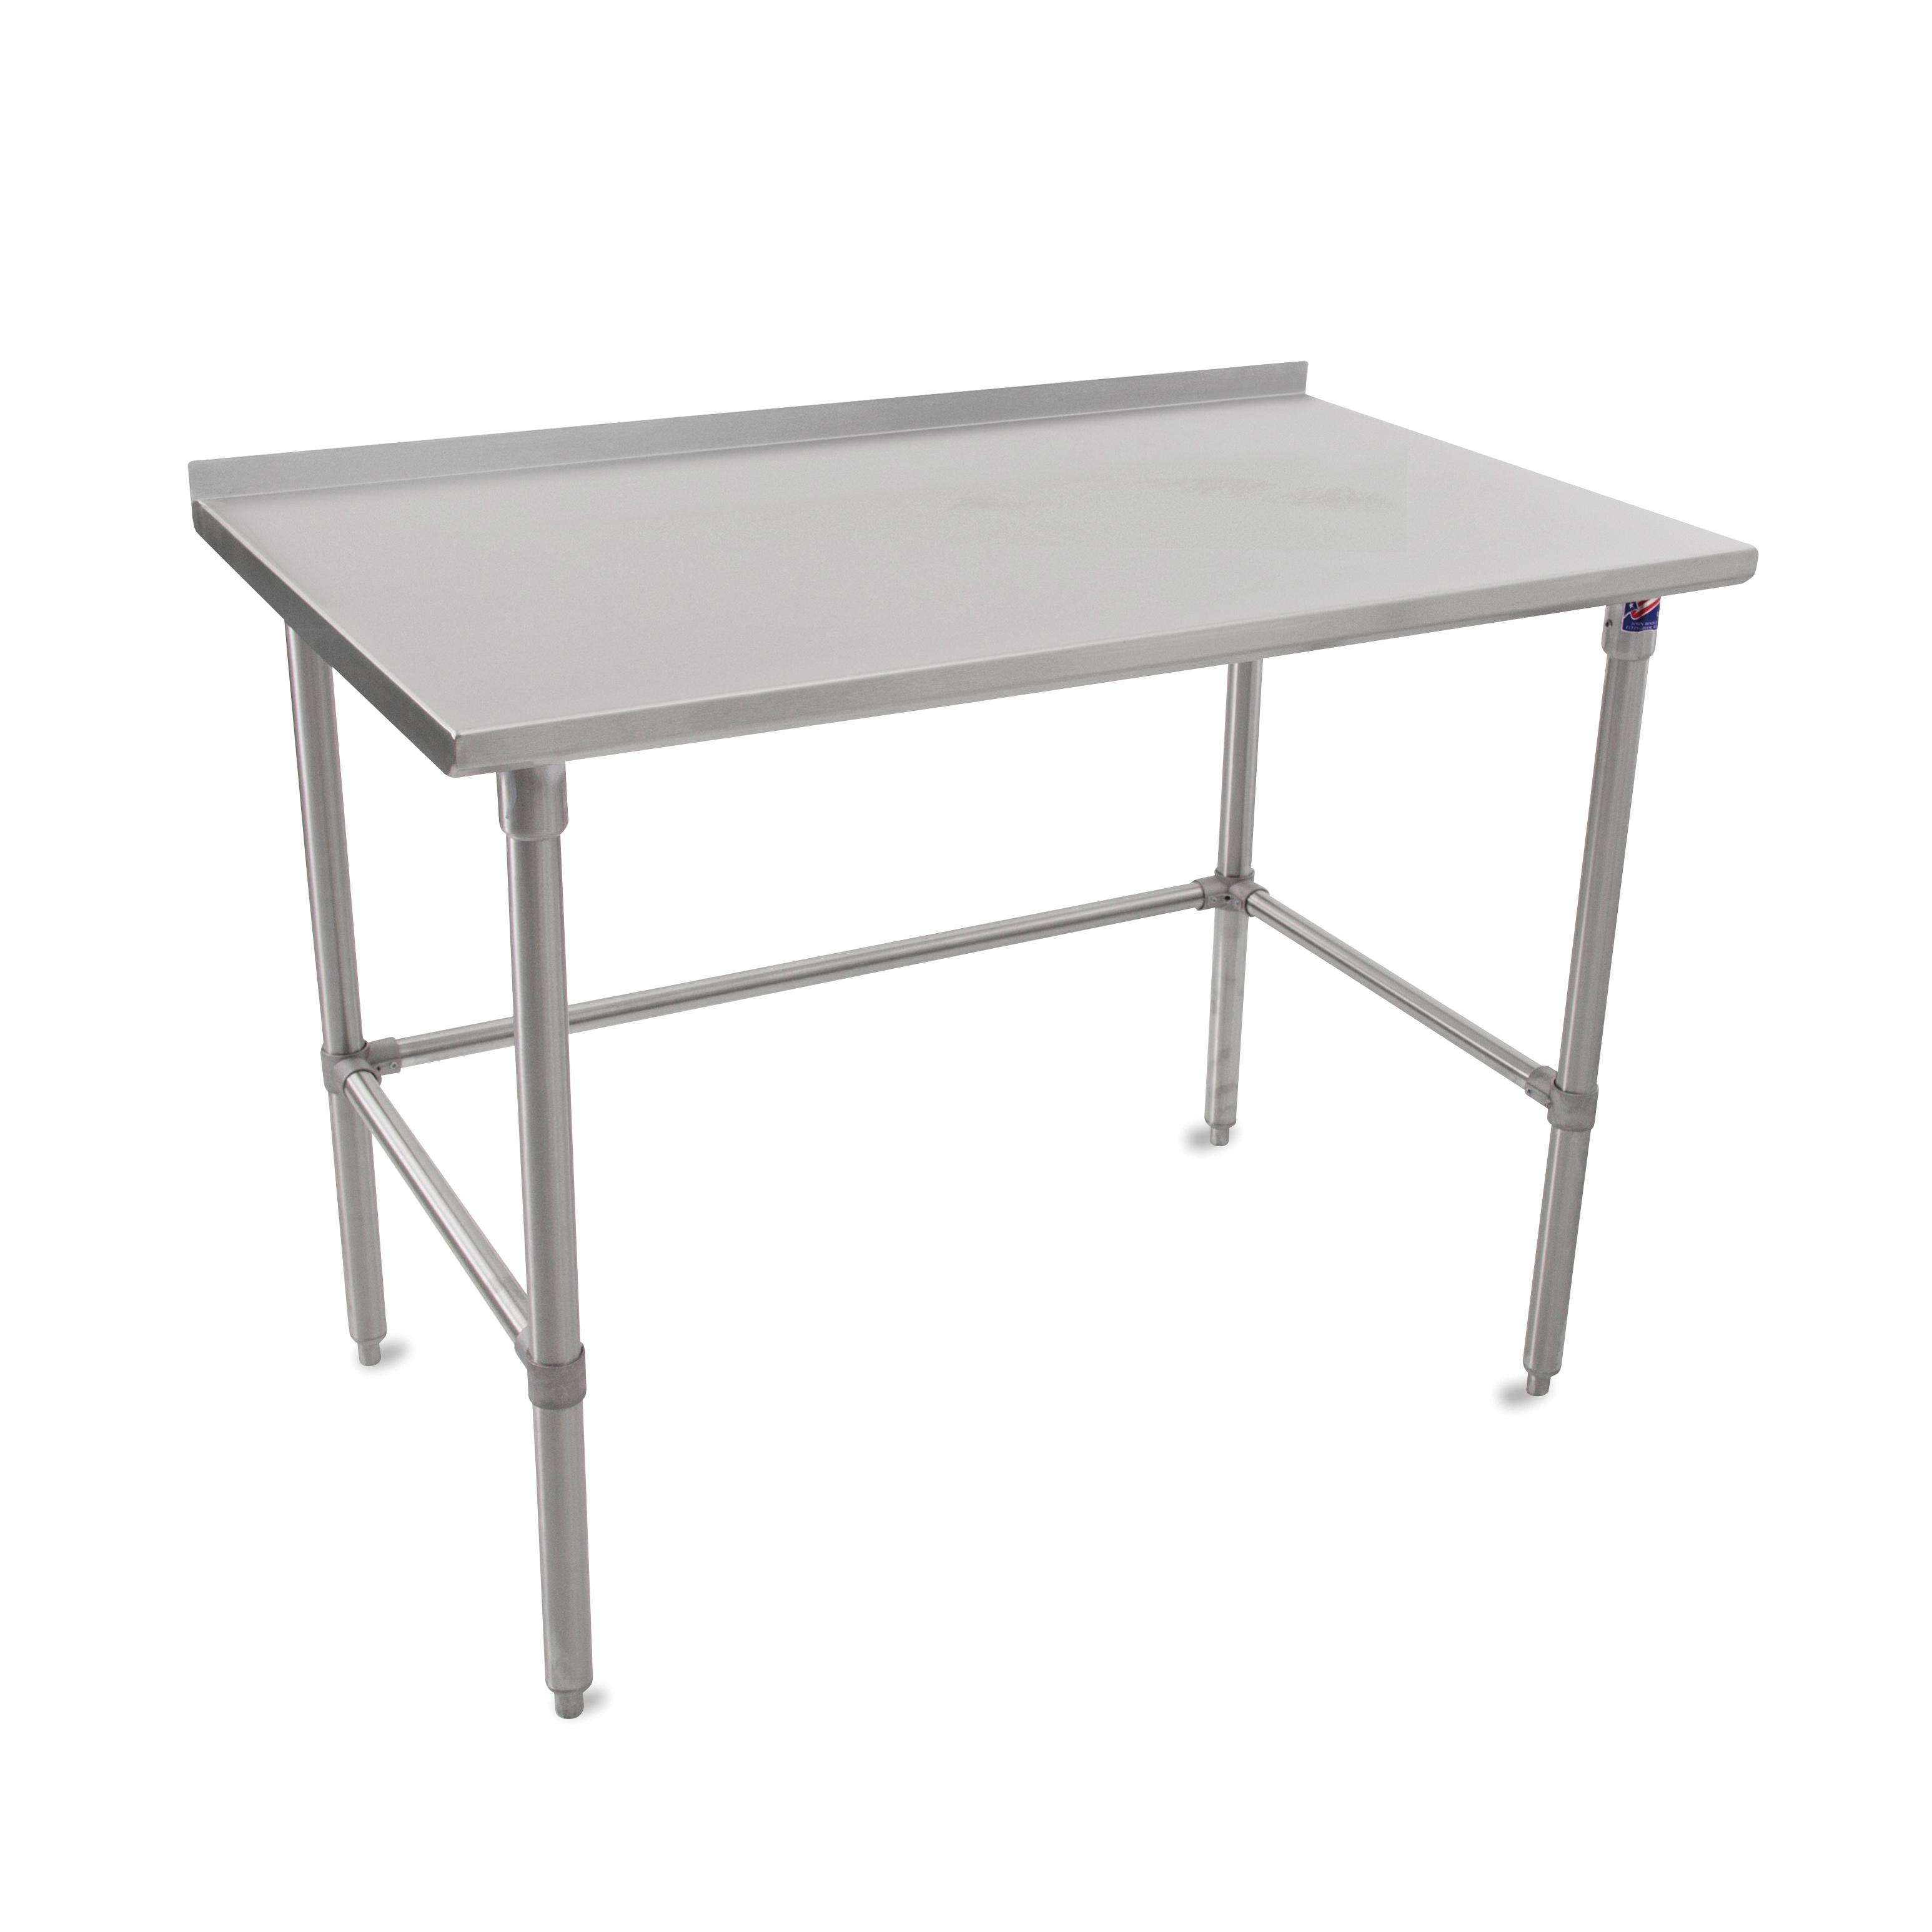 John Boos ST6R1.5-30120SBK work table, 109